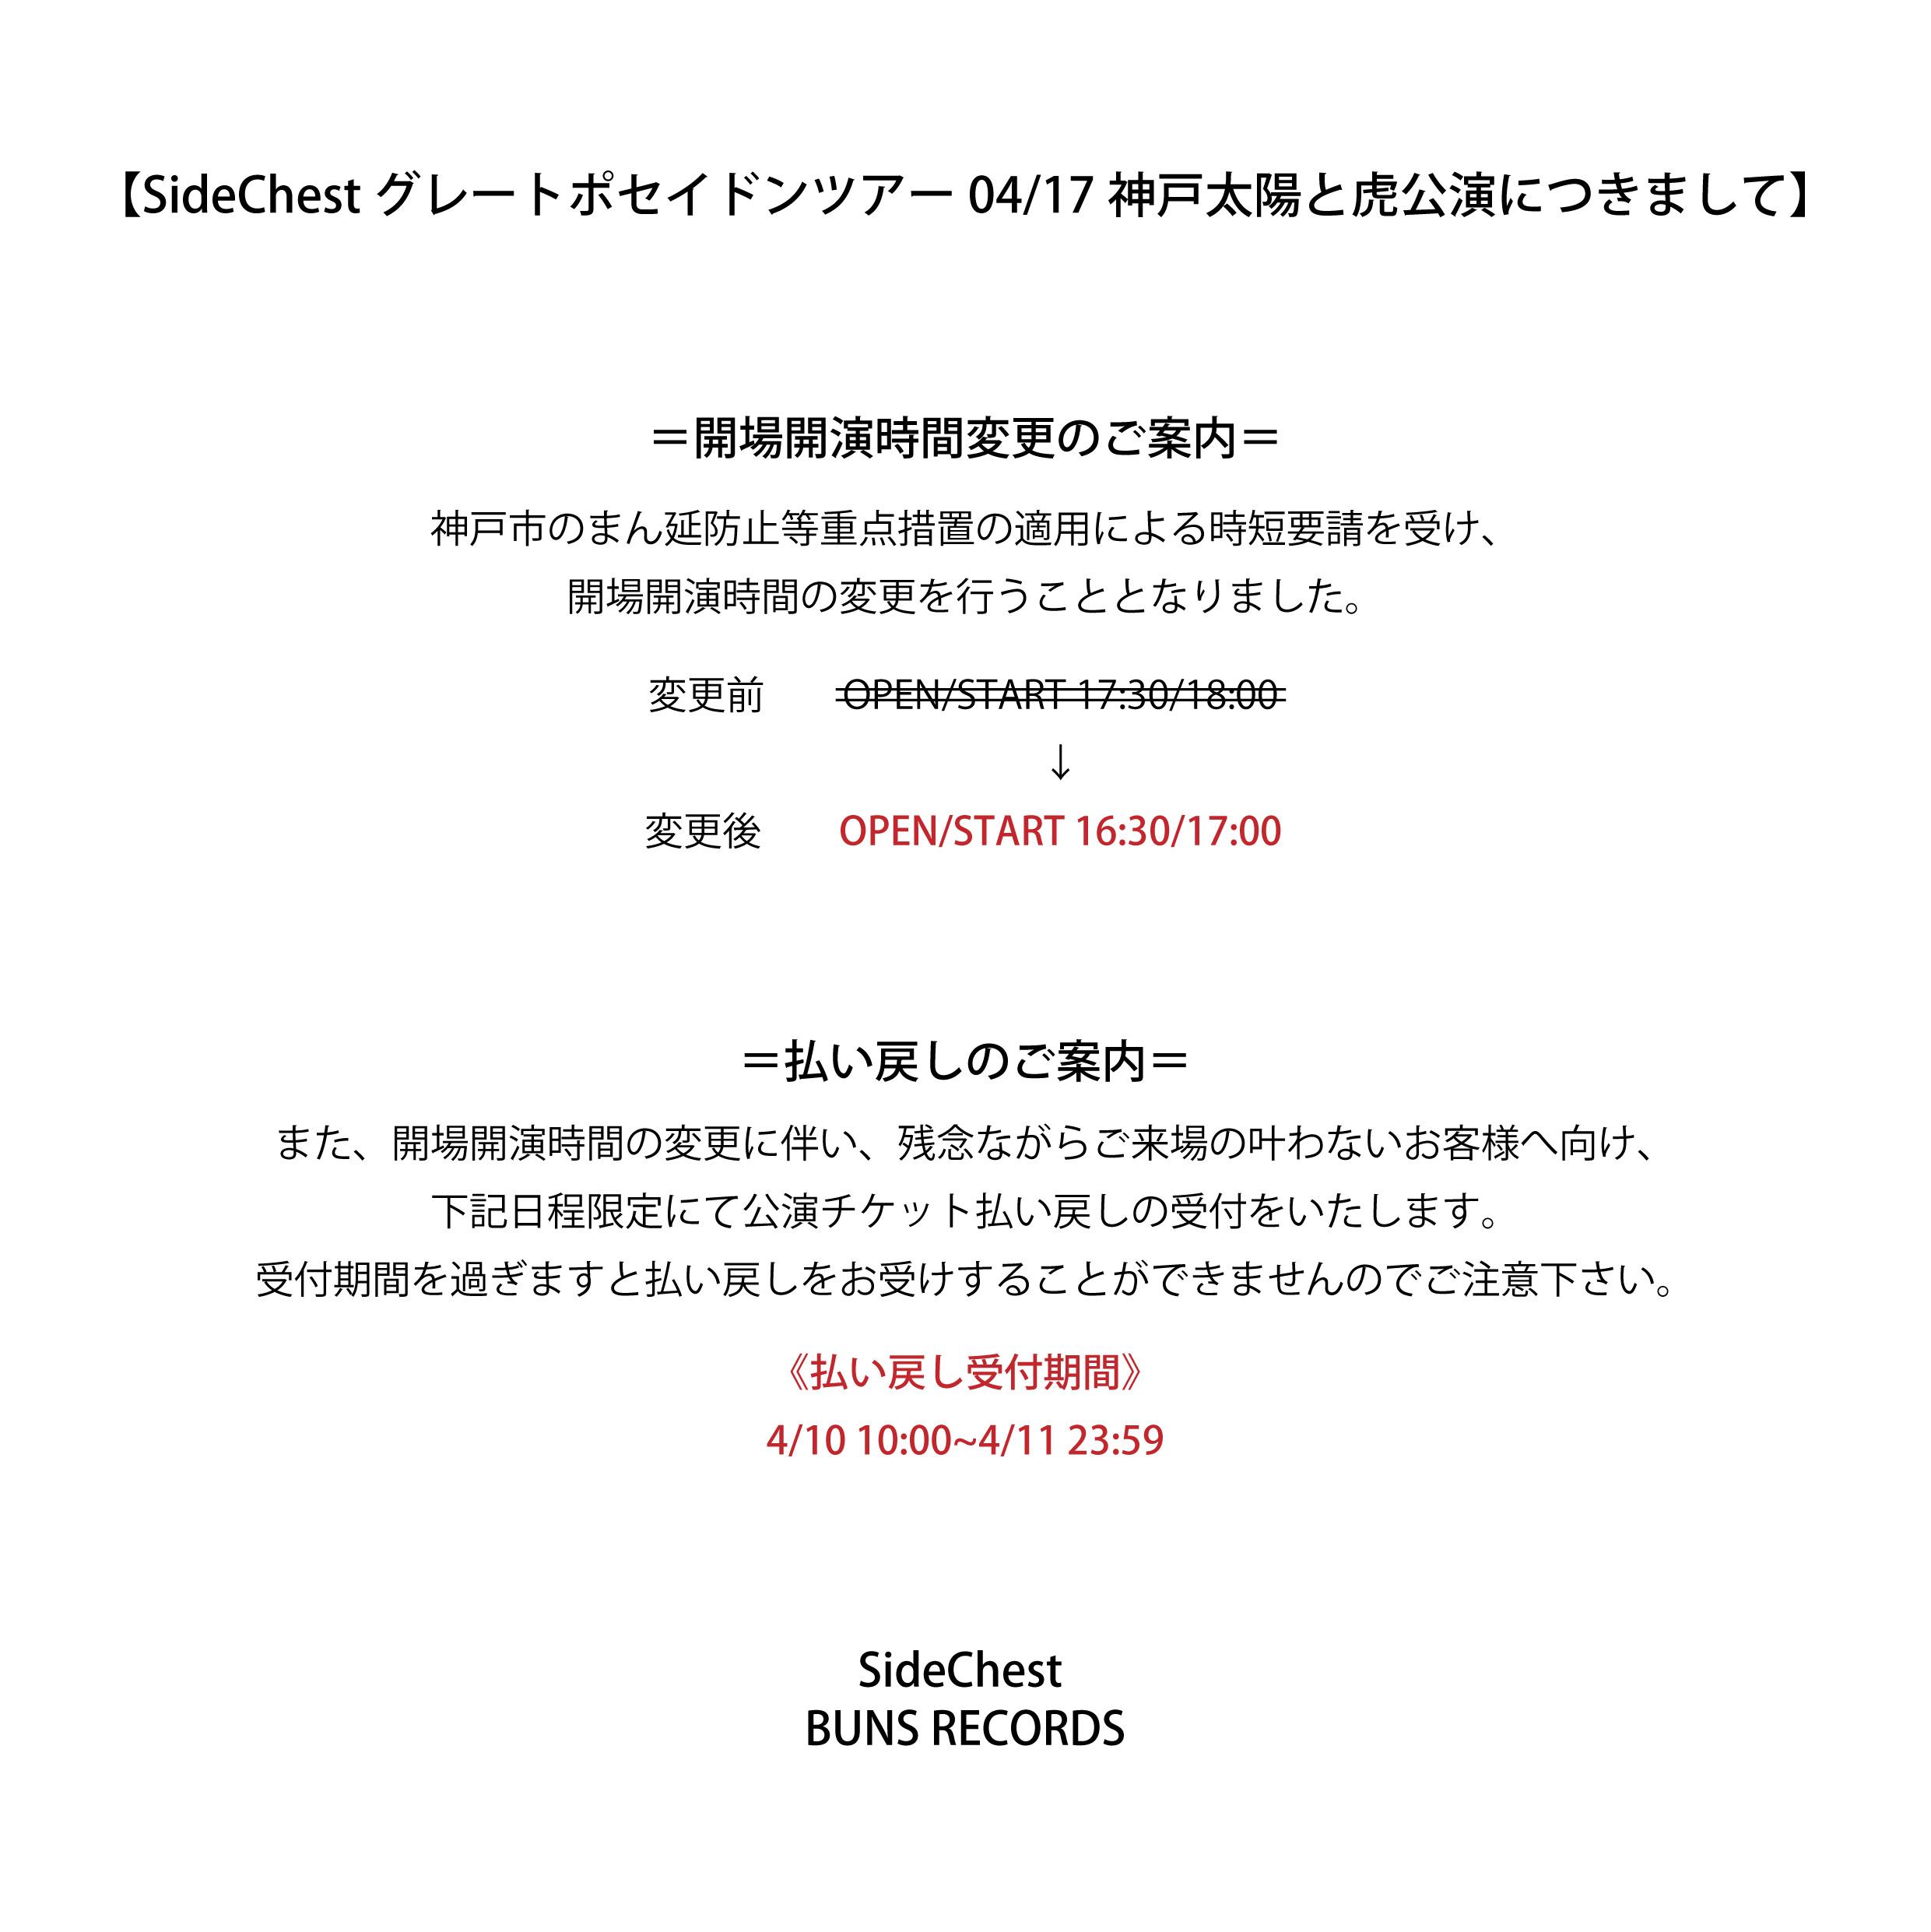 "SideChest ""グレートポセイドンツアー -初日シリーズ-"""